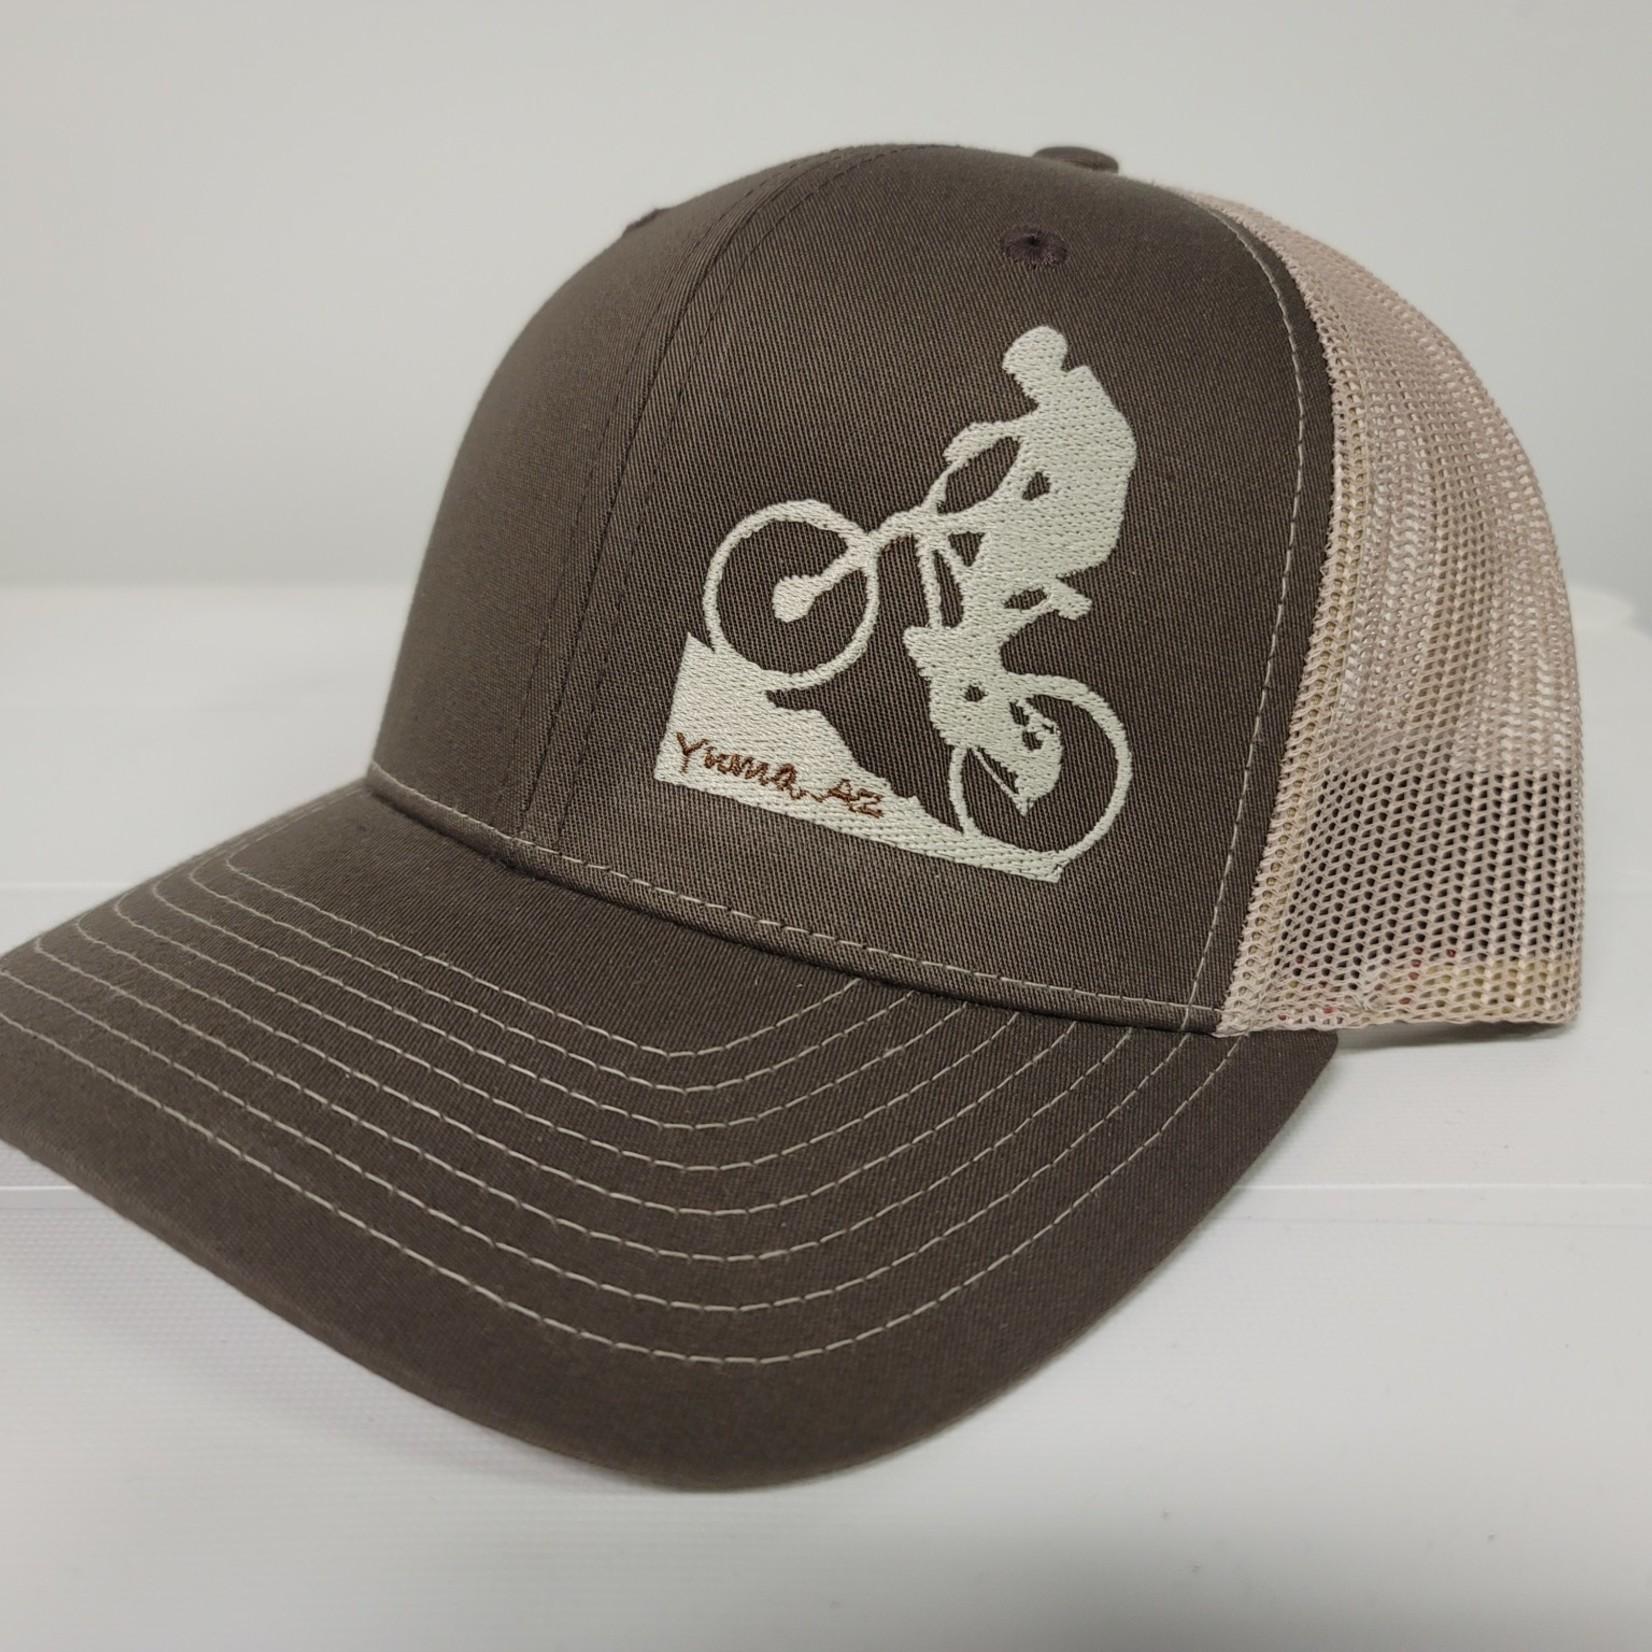 Richardson Hat - MTB - Brn/Tan - Snapback